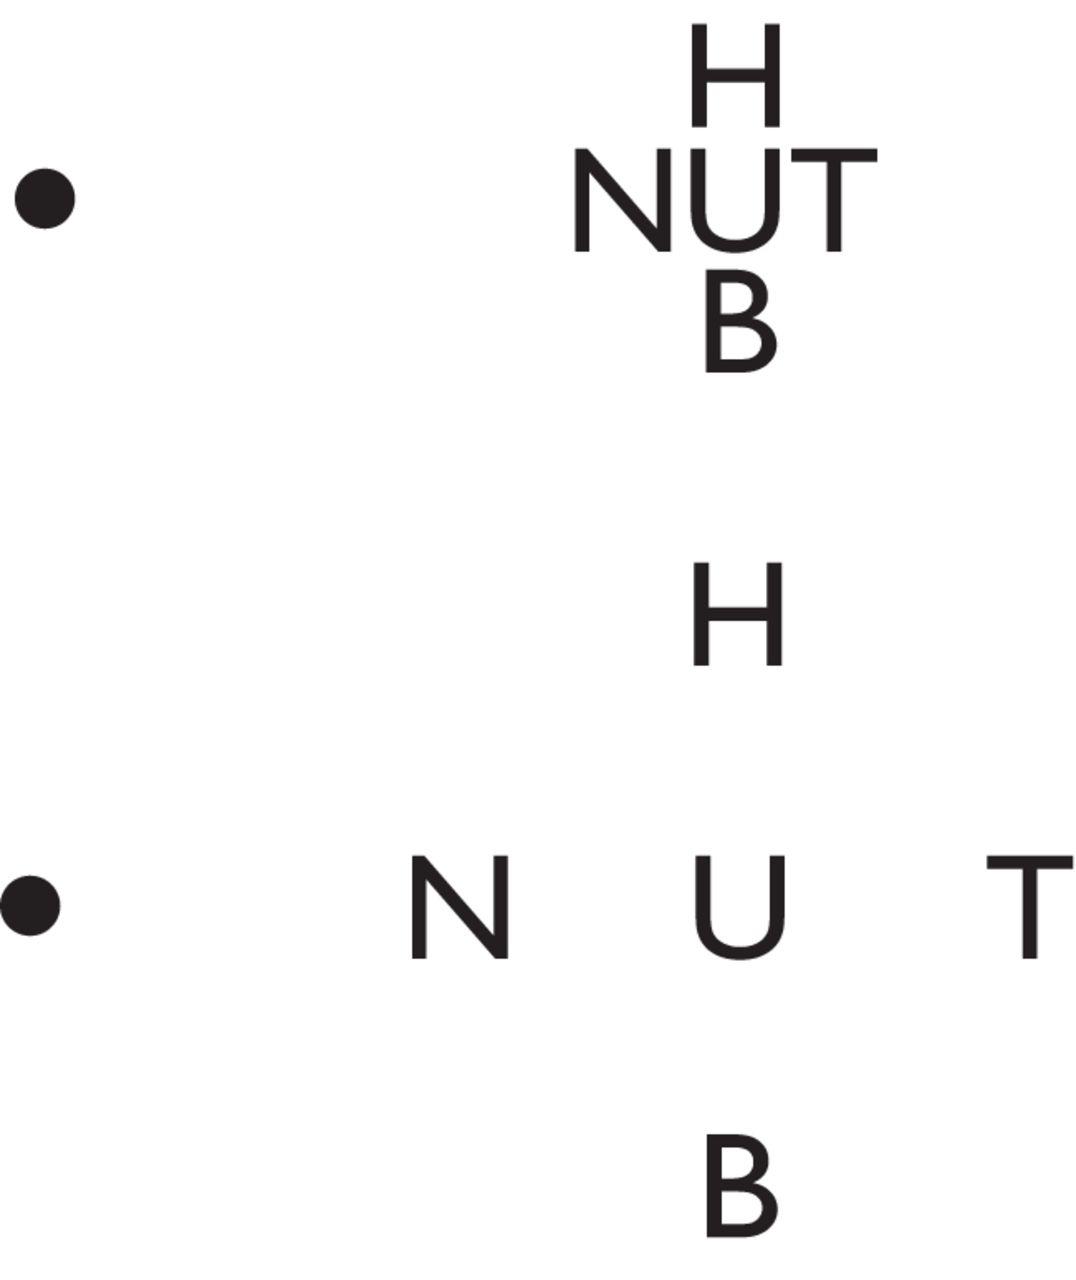 Integrating Retinotopic Features in Spatiotopic Coordinates